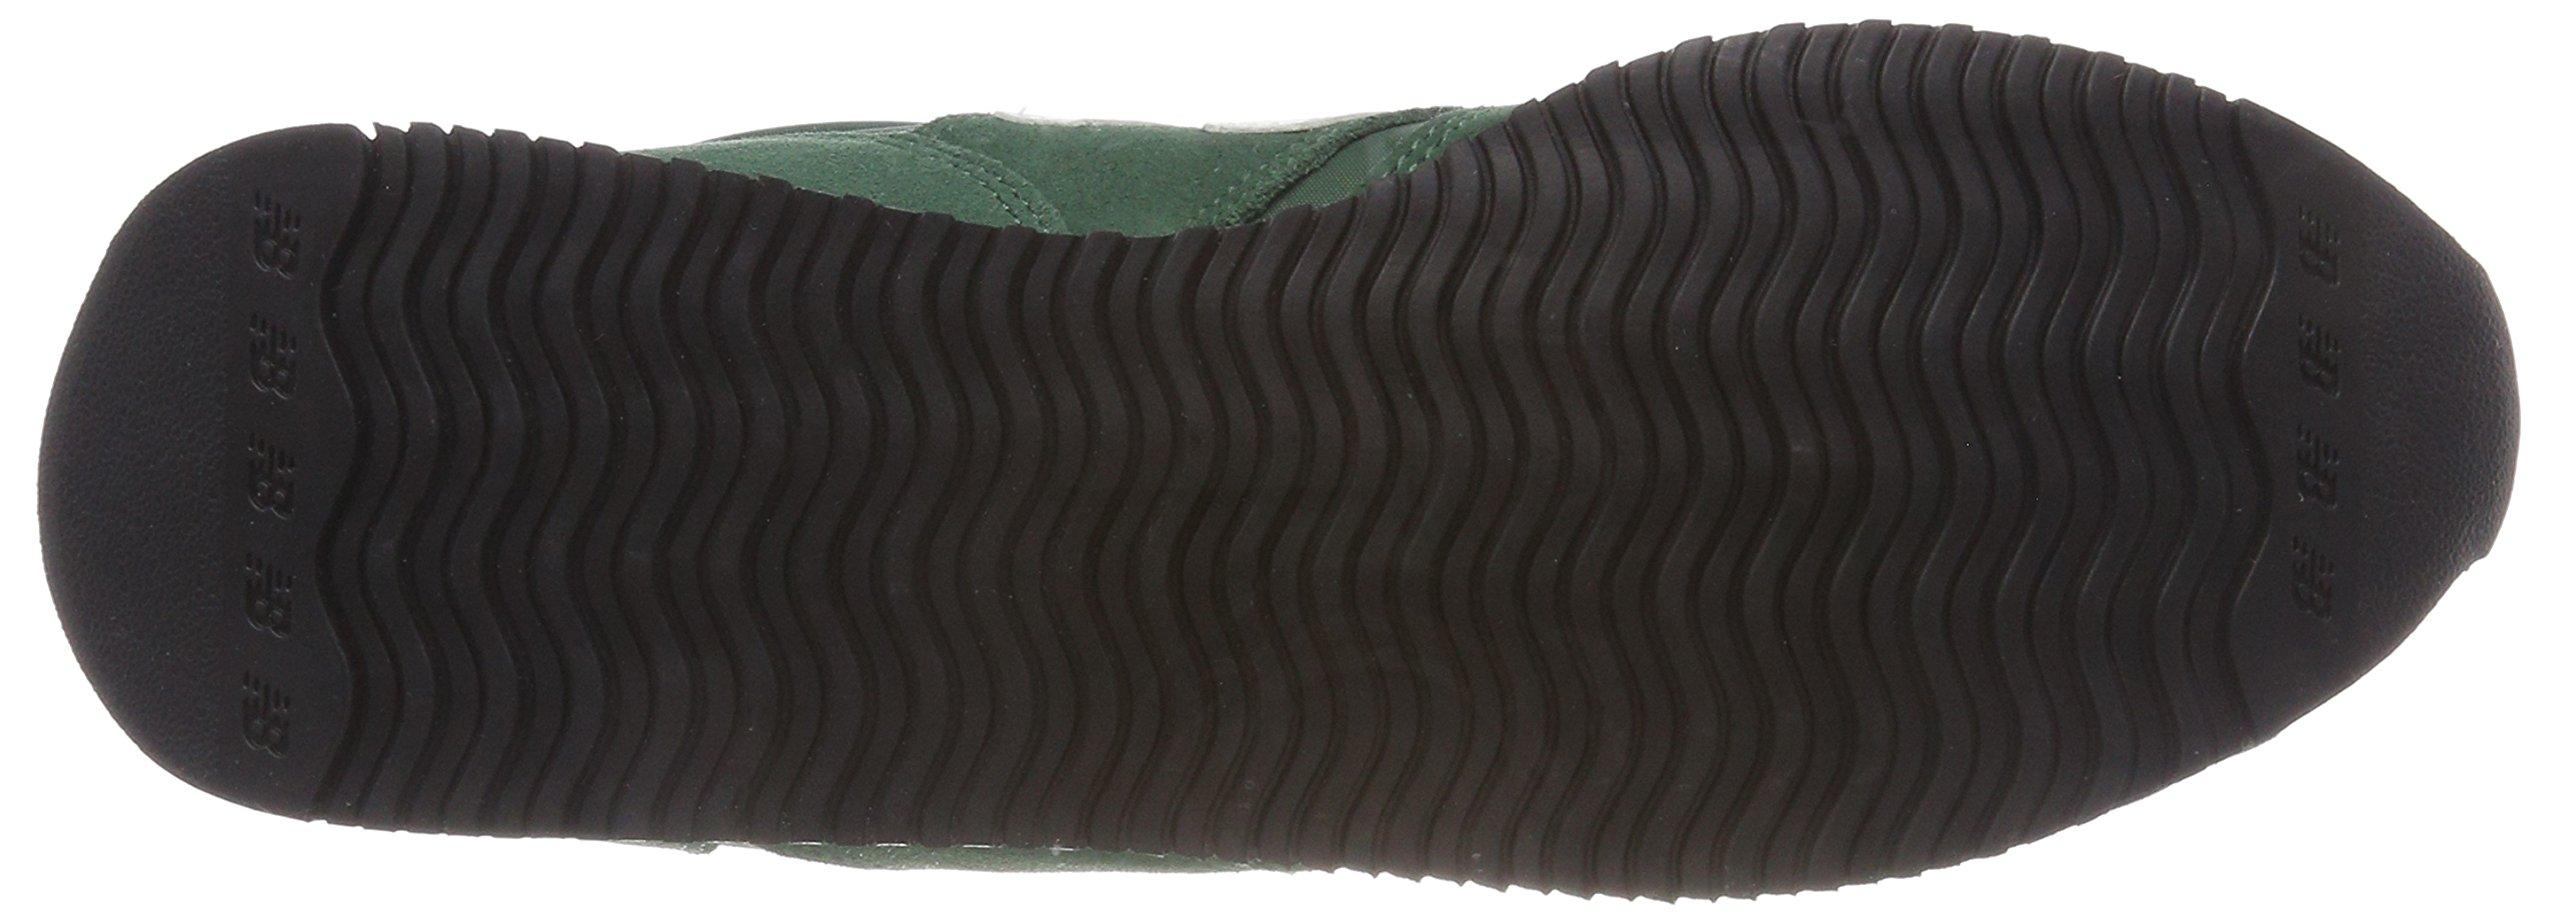 New Balance U420v1, Zapatillas Unisex Adulto